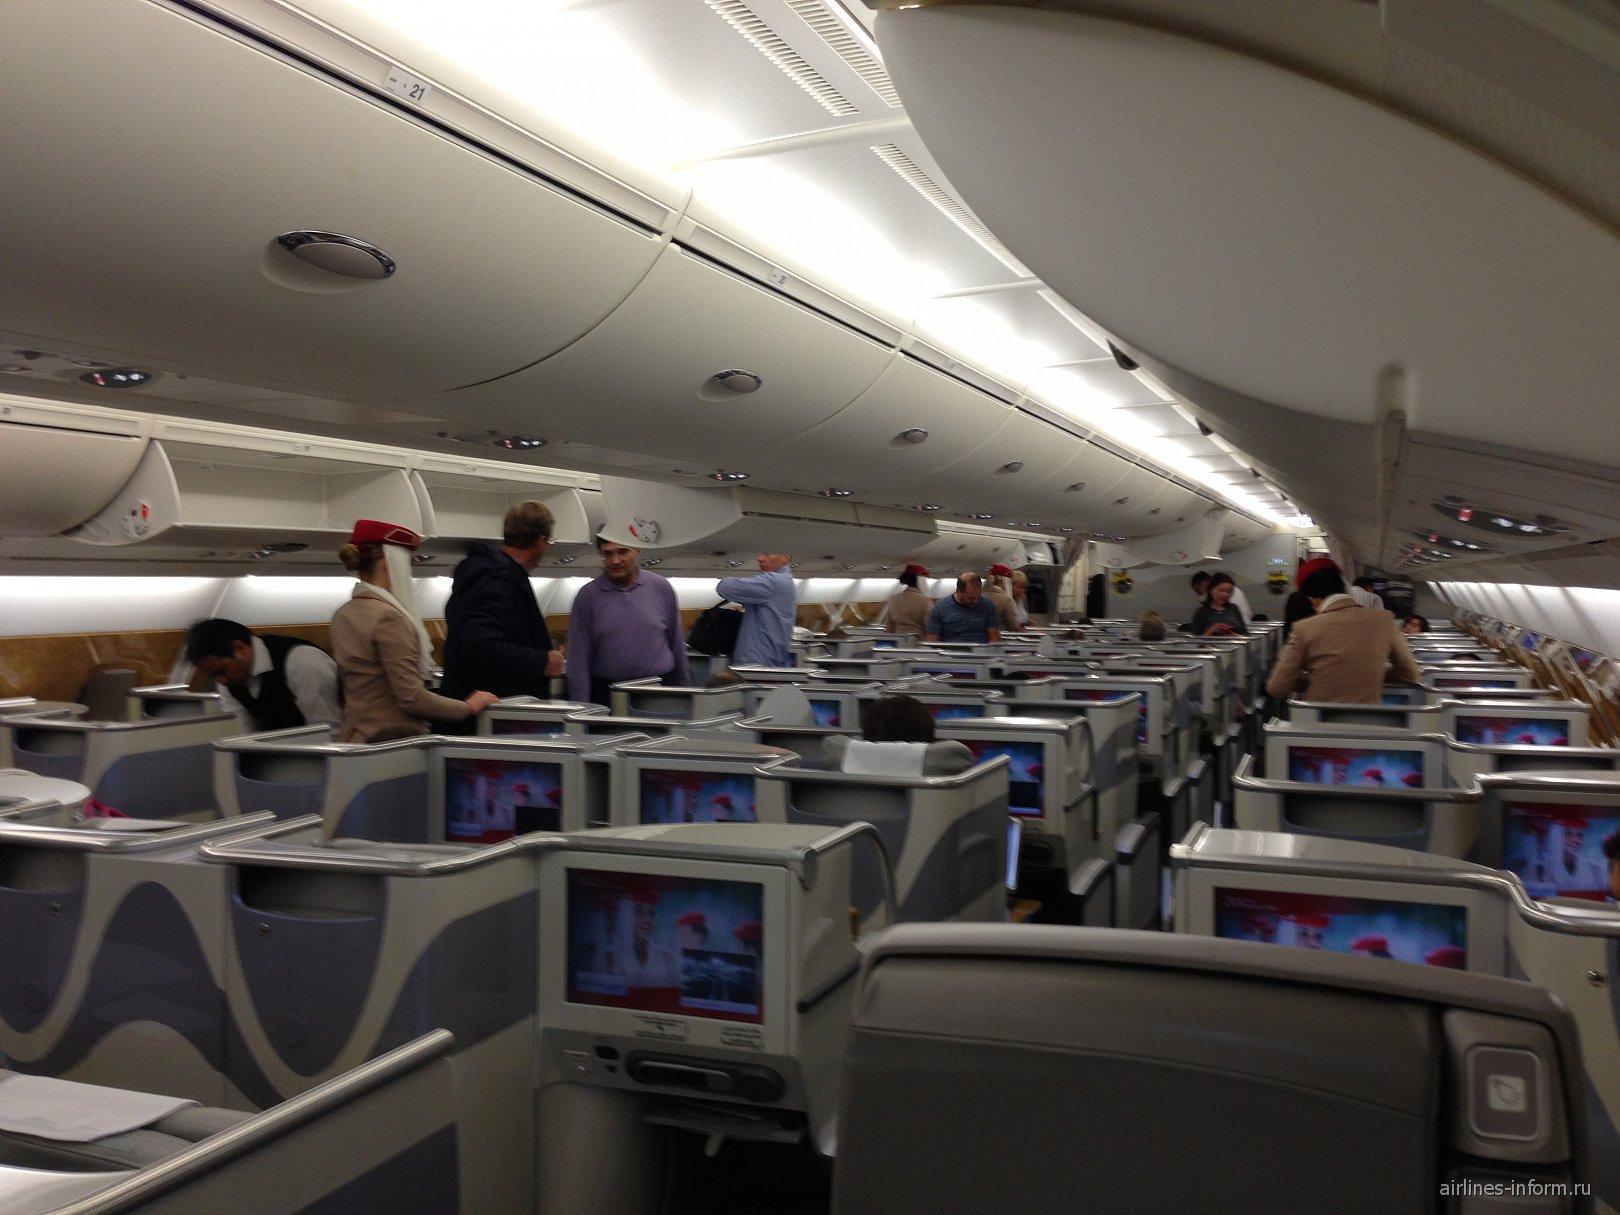 Салон бизнес-класса в самолете Airbus A380 авиакомпании Emirates